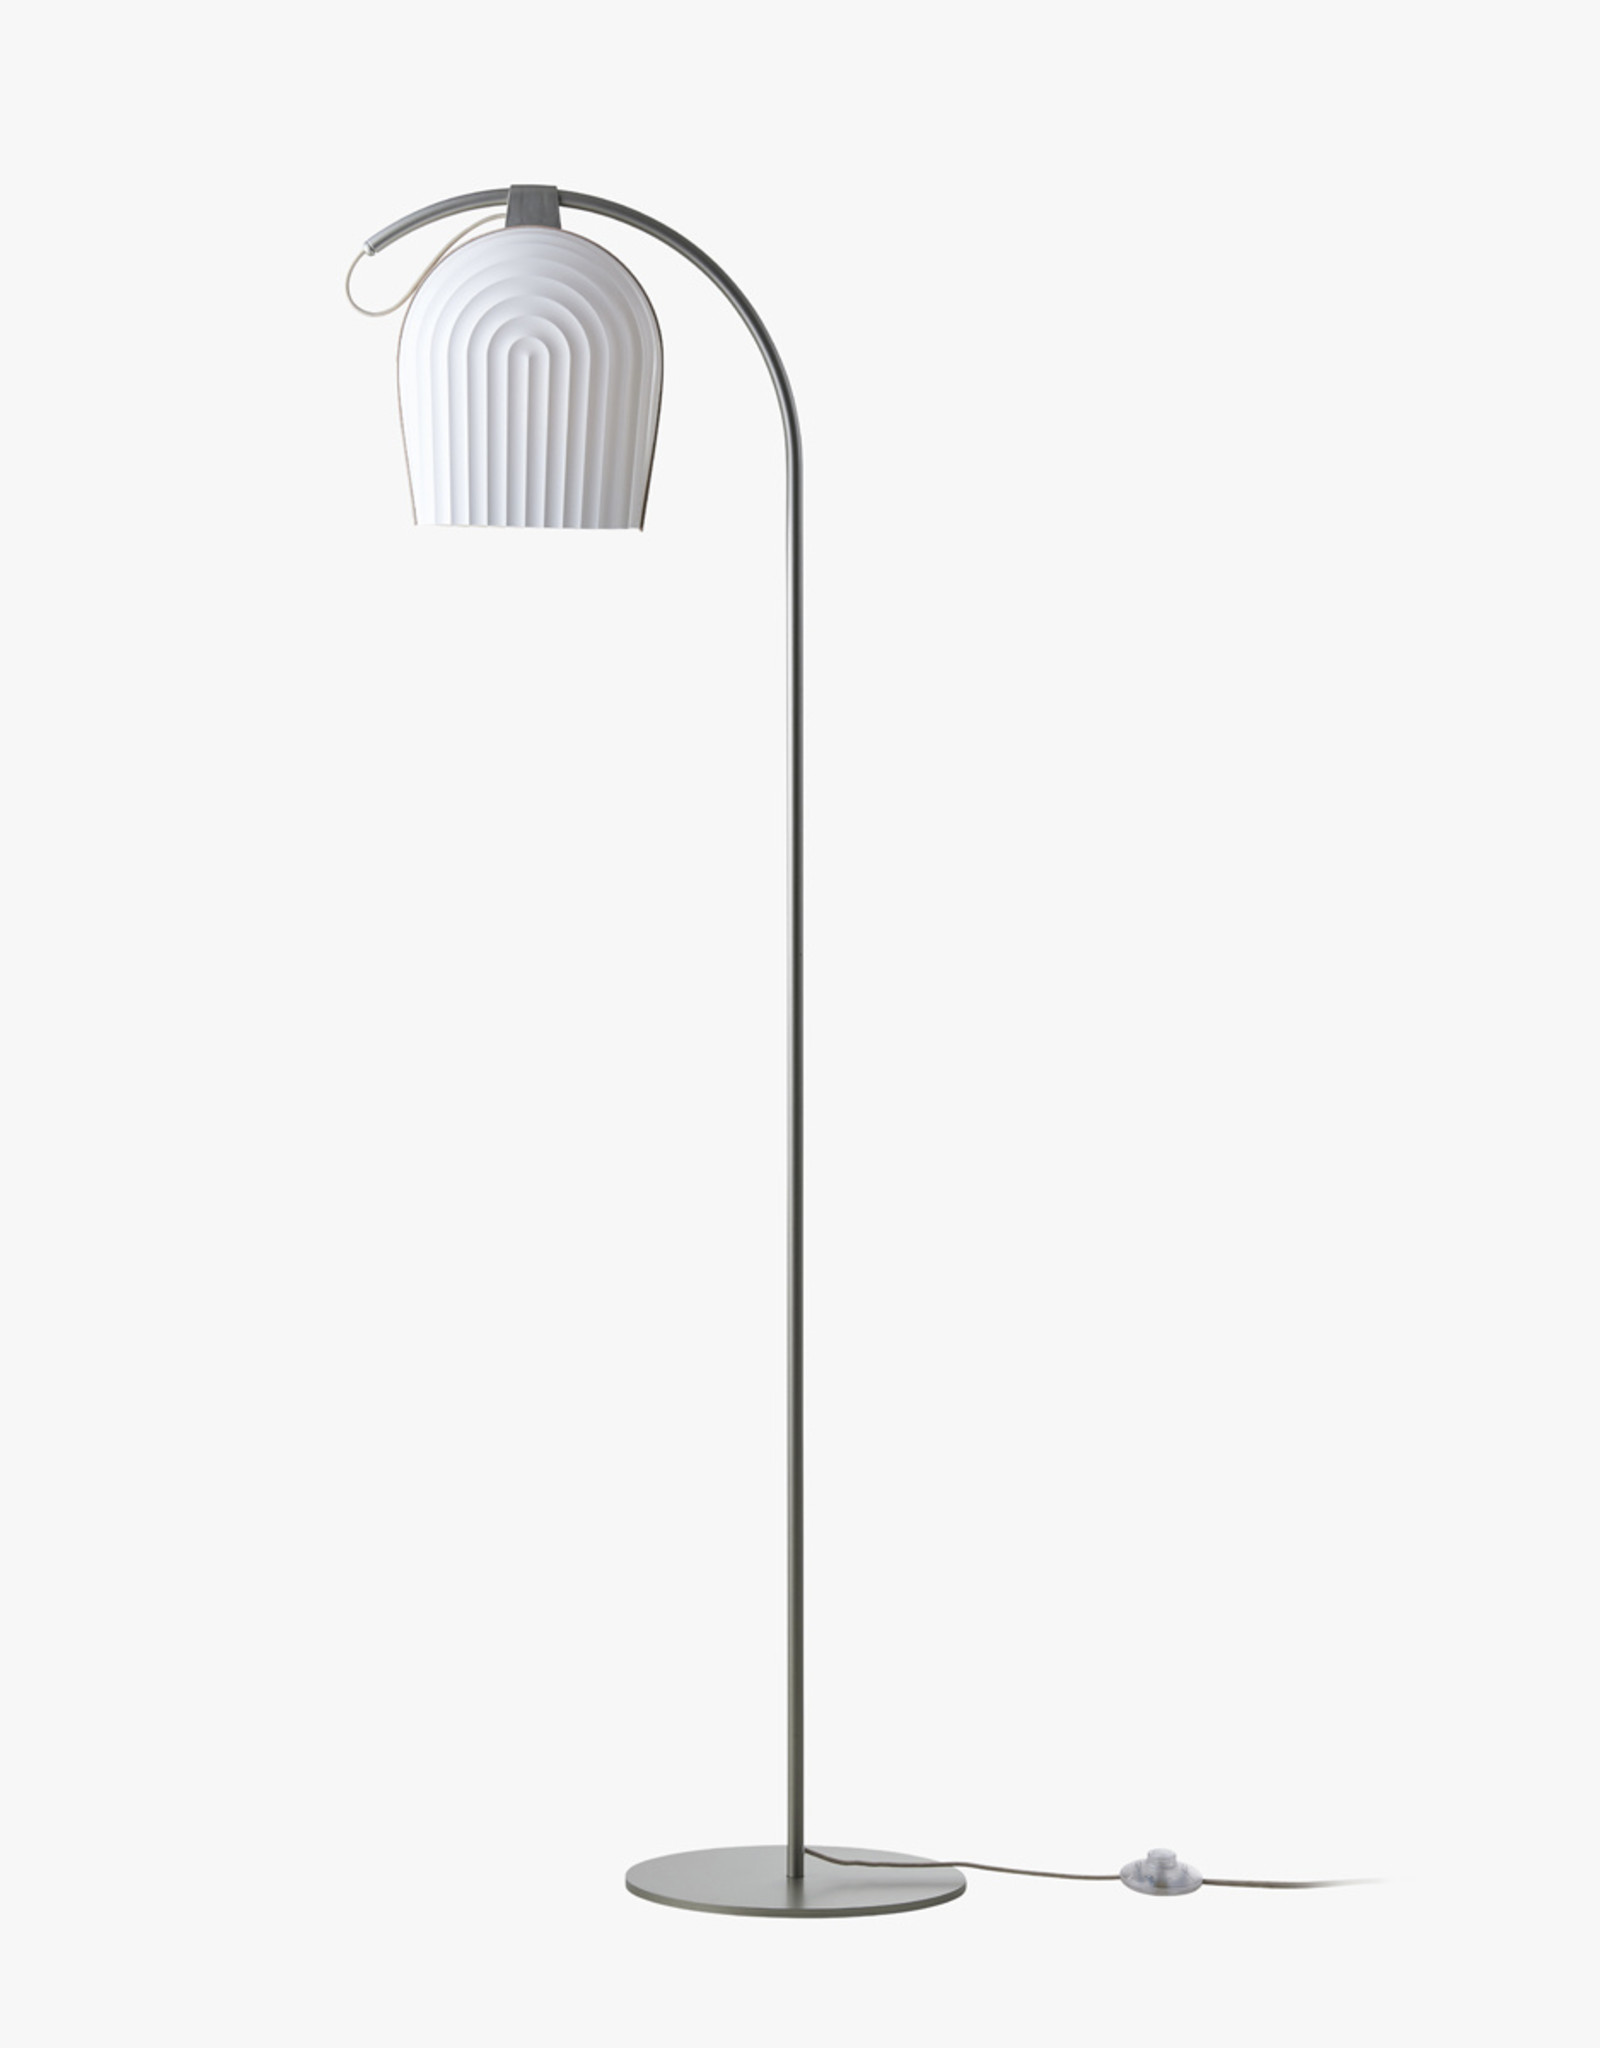 Arc 387 floor light by N.Neergaard & M.Hesseldahl | Plastic | Champagne | Dia28cm x H142cm | 1x E27 800 LM max. 15W LED bulb required